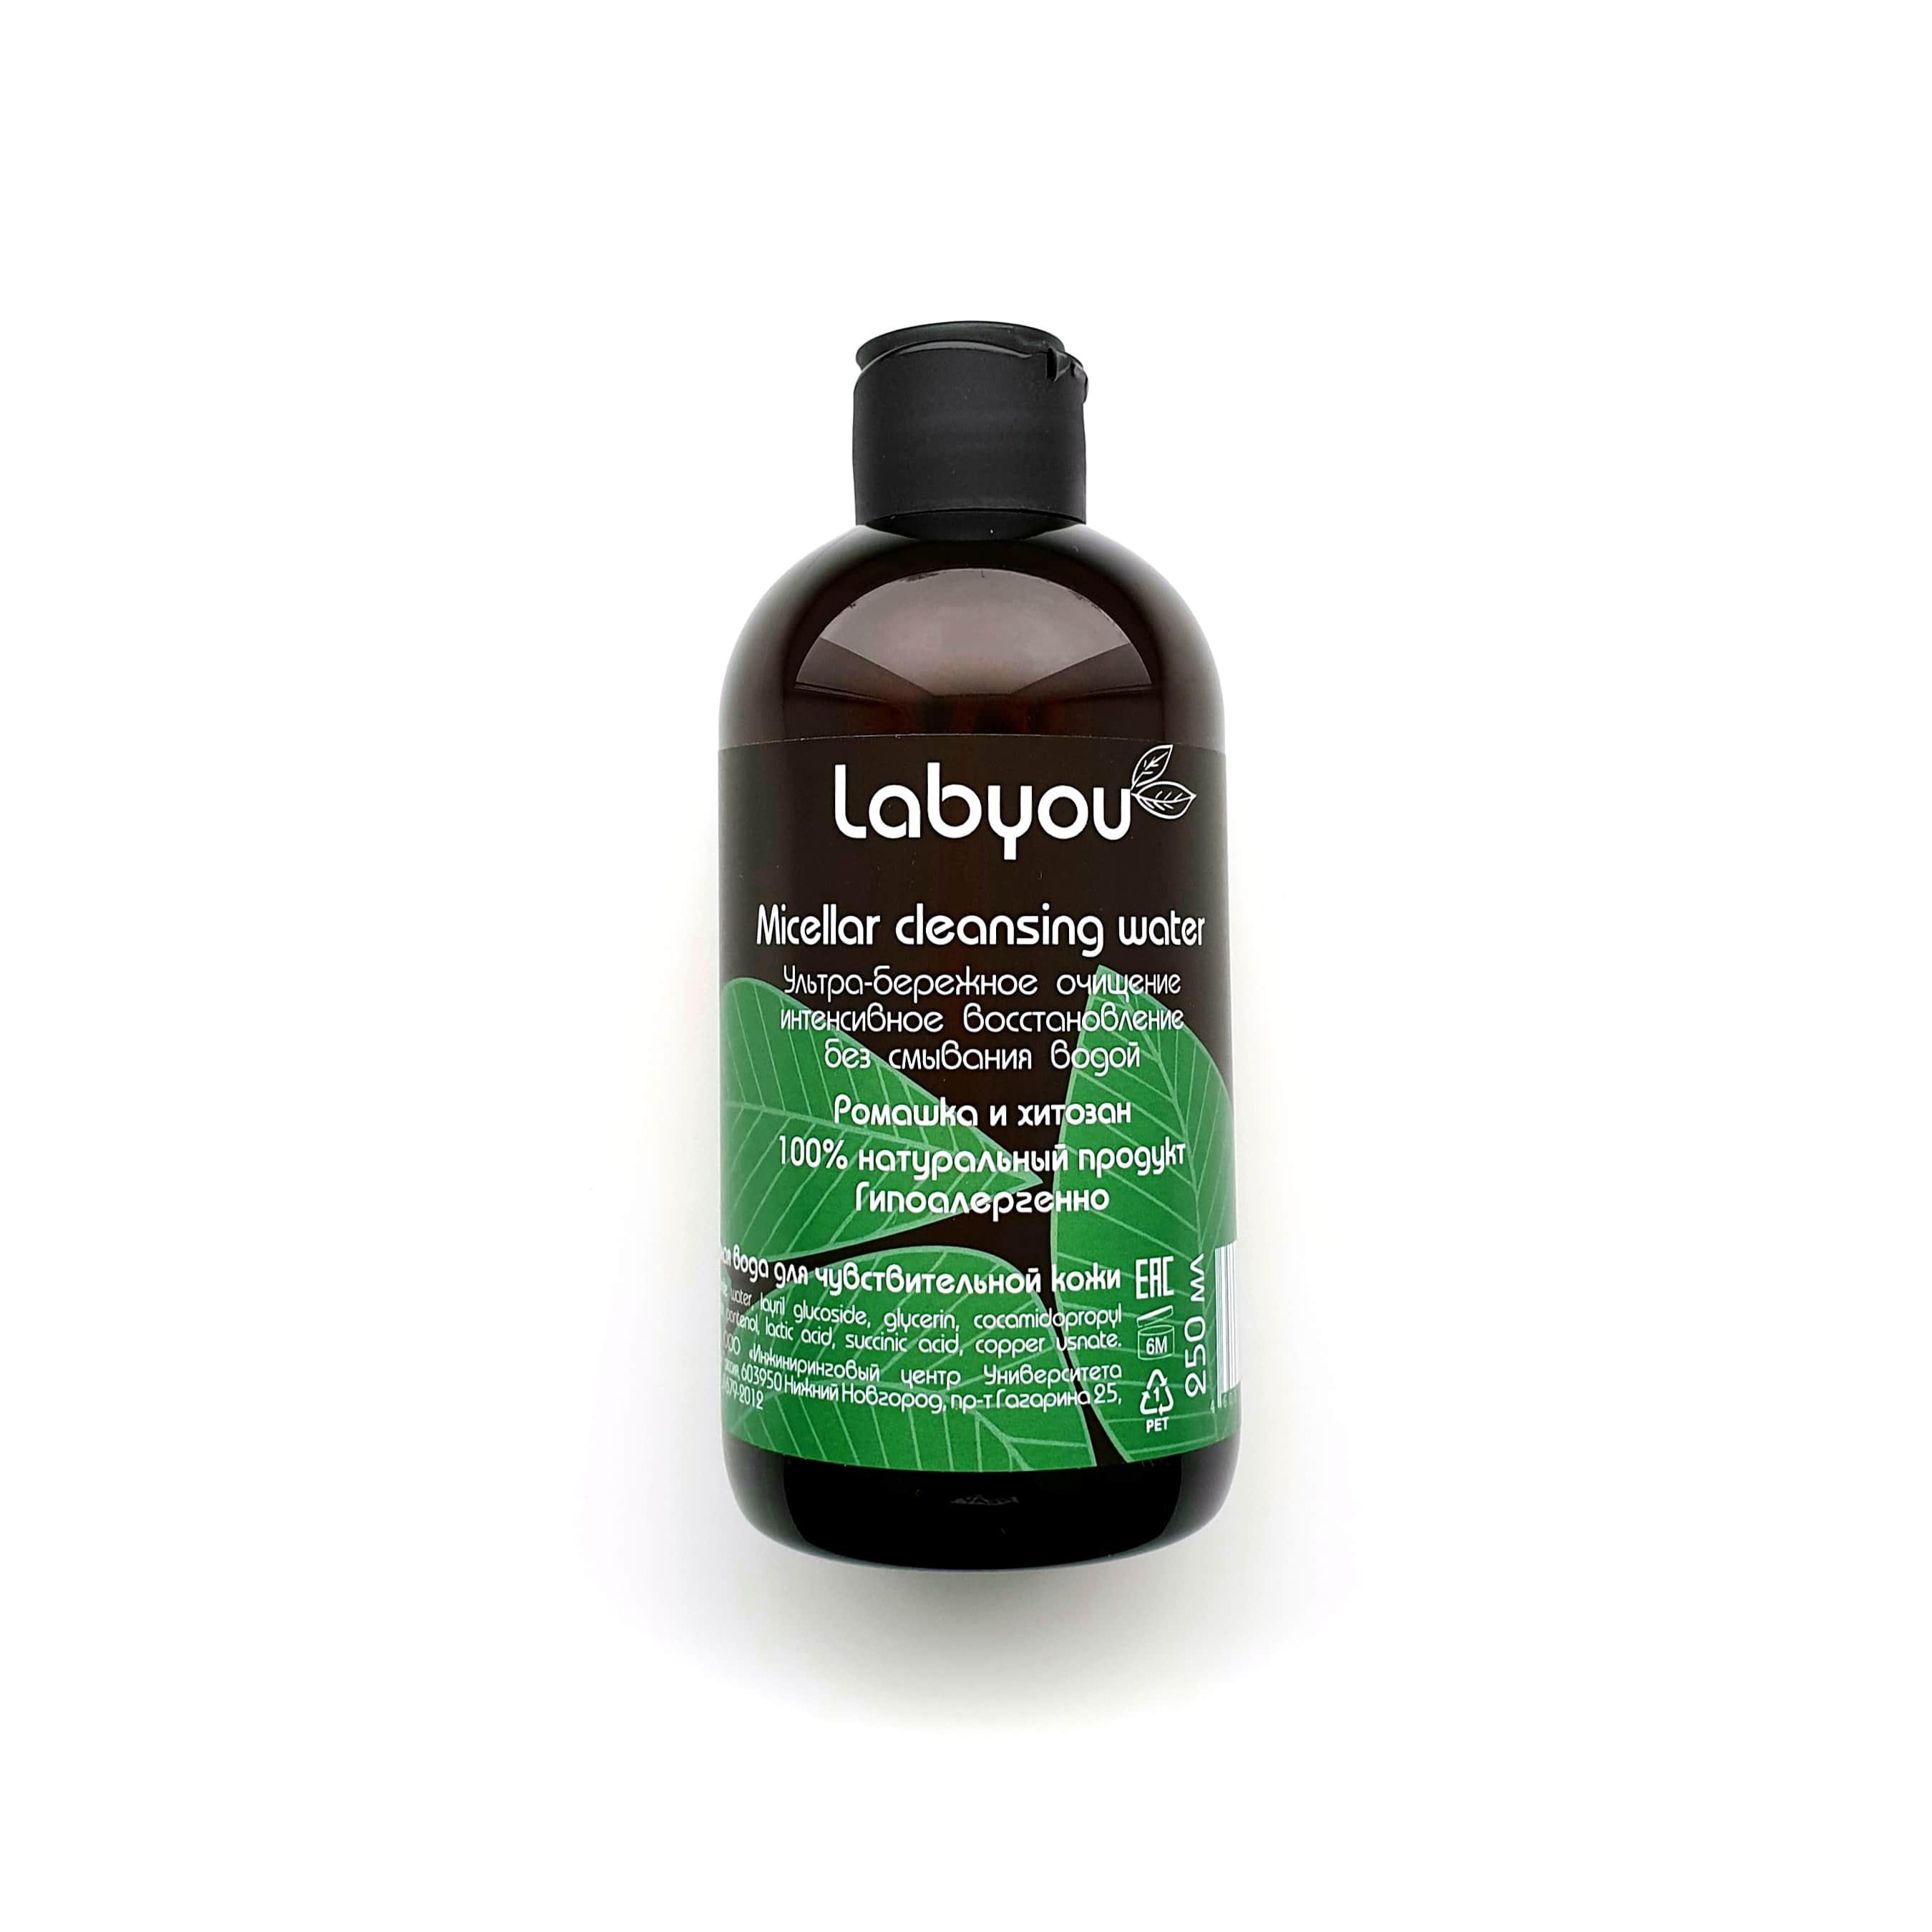 Мицеллярная вода LabYou Micellar cleansing water